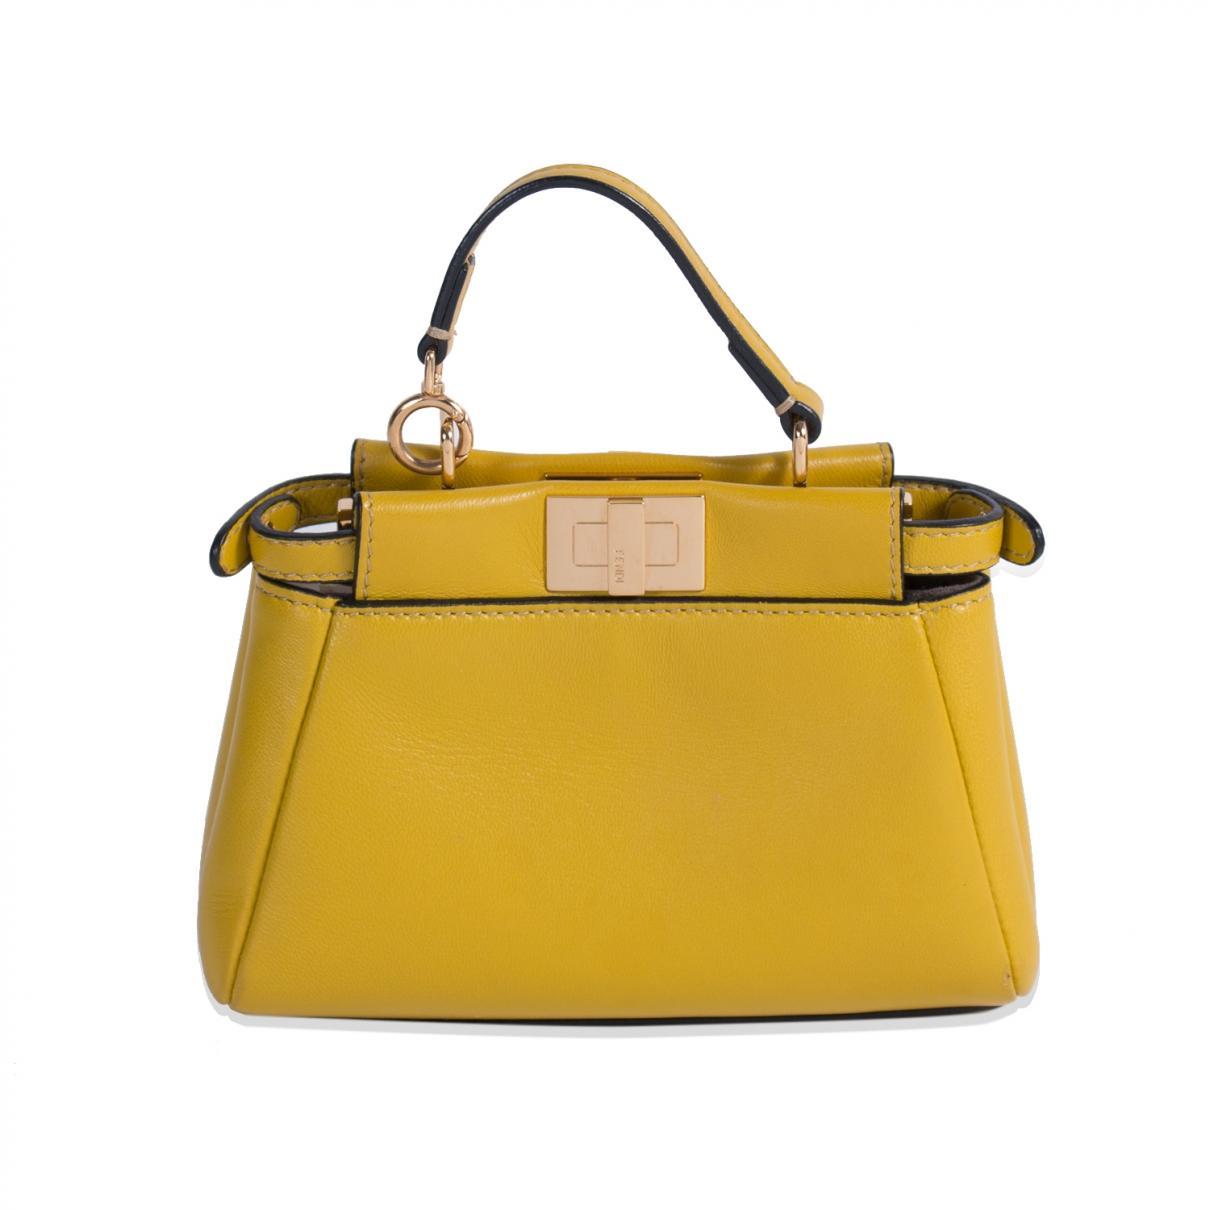 8625b301 Fendi Pre-owned Peekaboo Yellow Leather Handbags in Yellow - Lyst